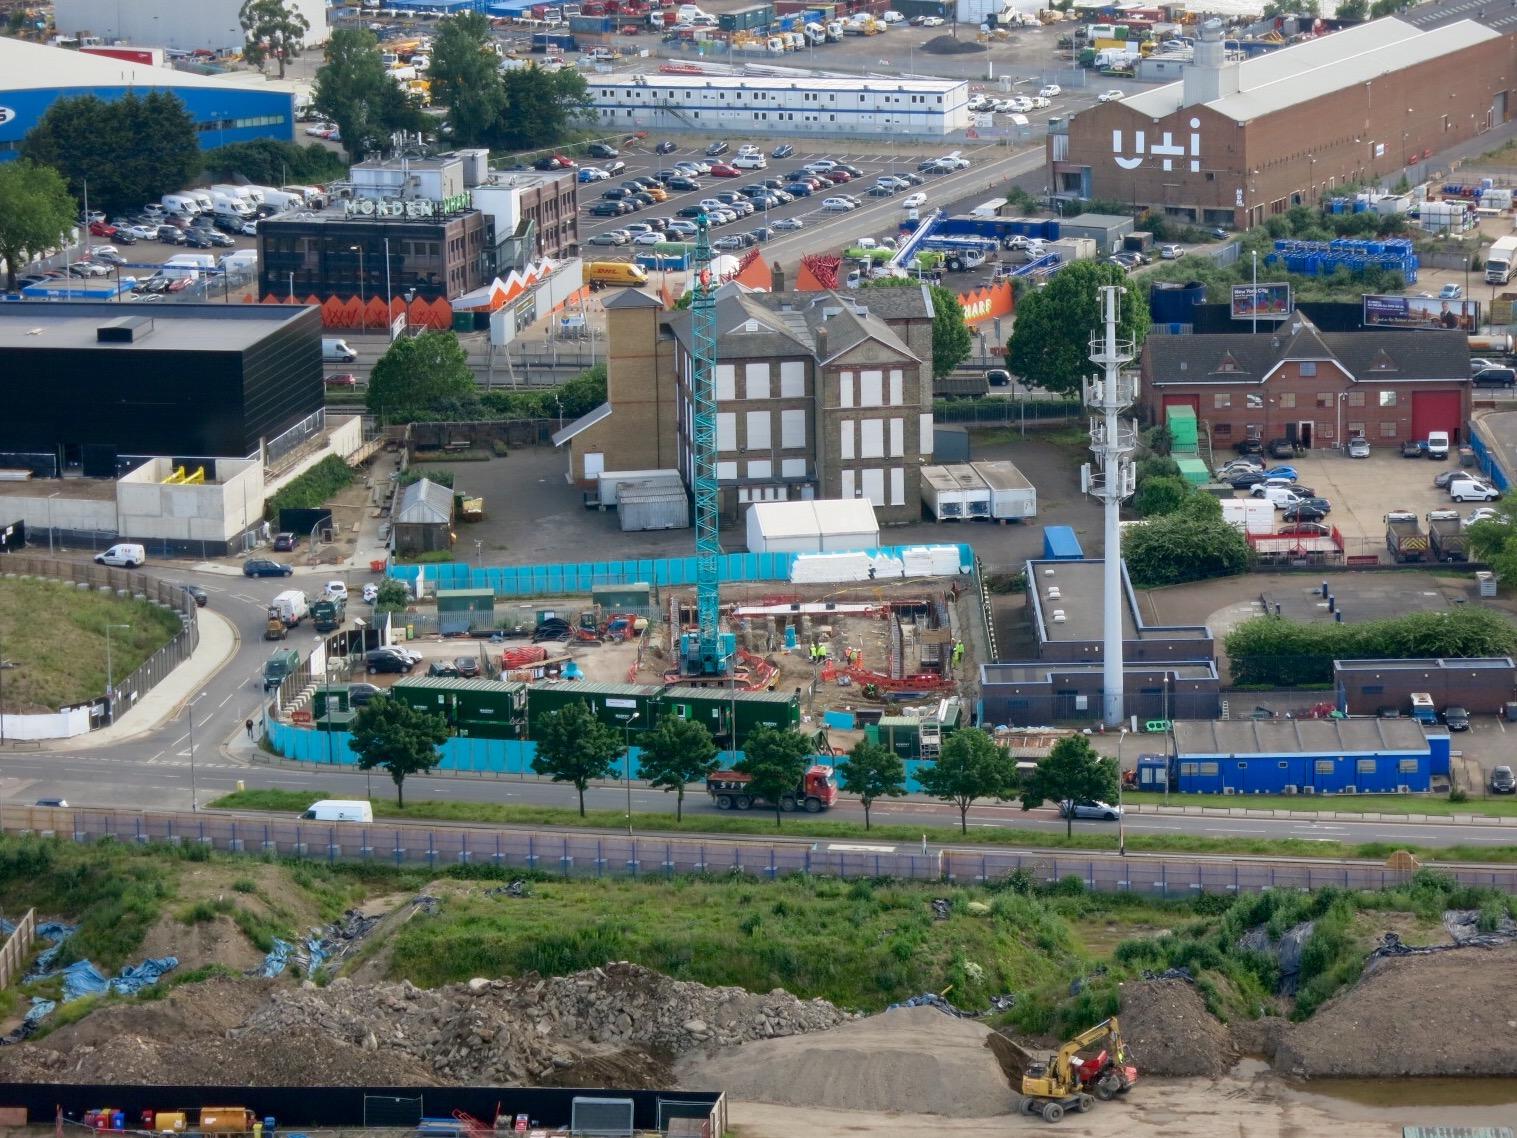 Groundworks begin on site, June 2016 [greenpenlondon]